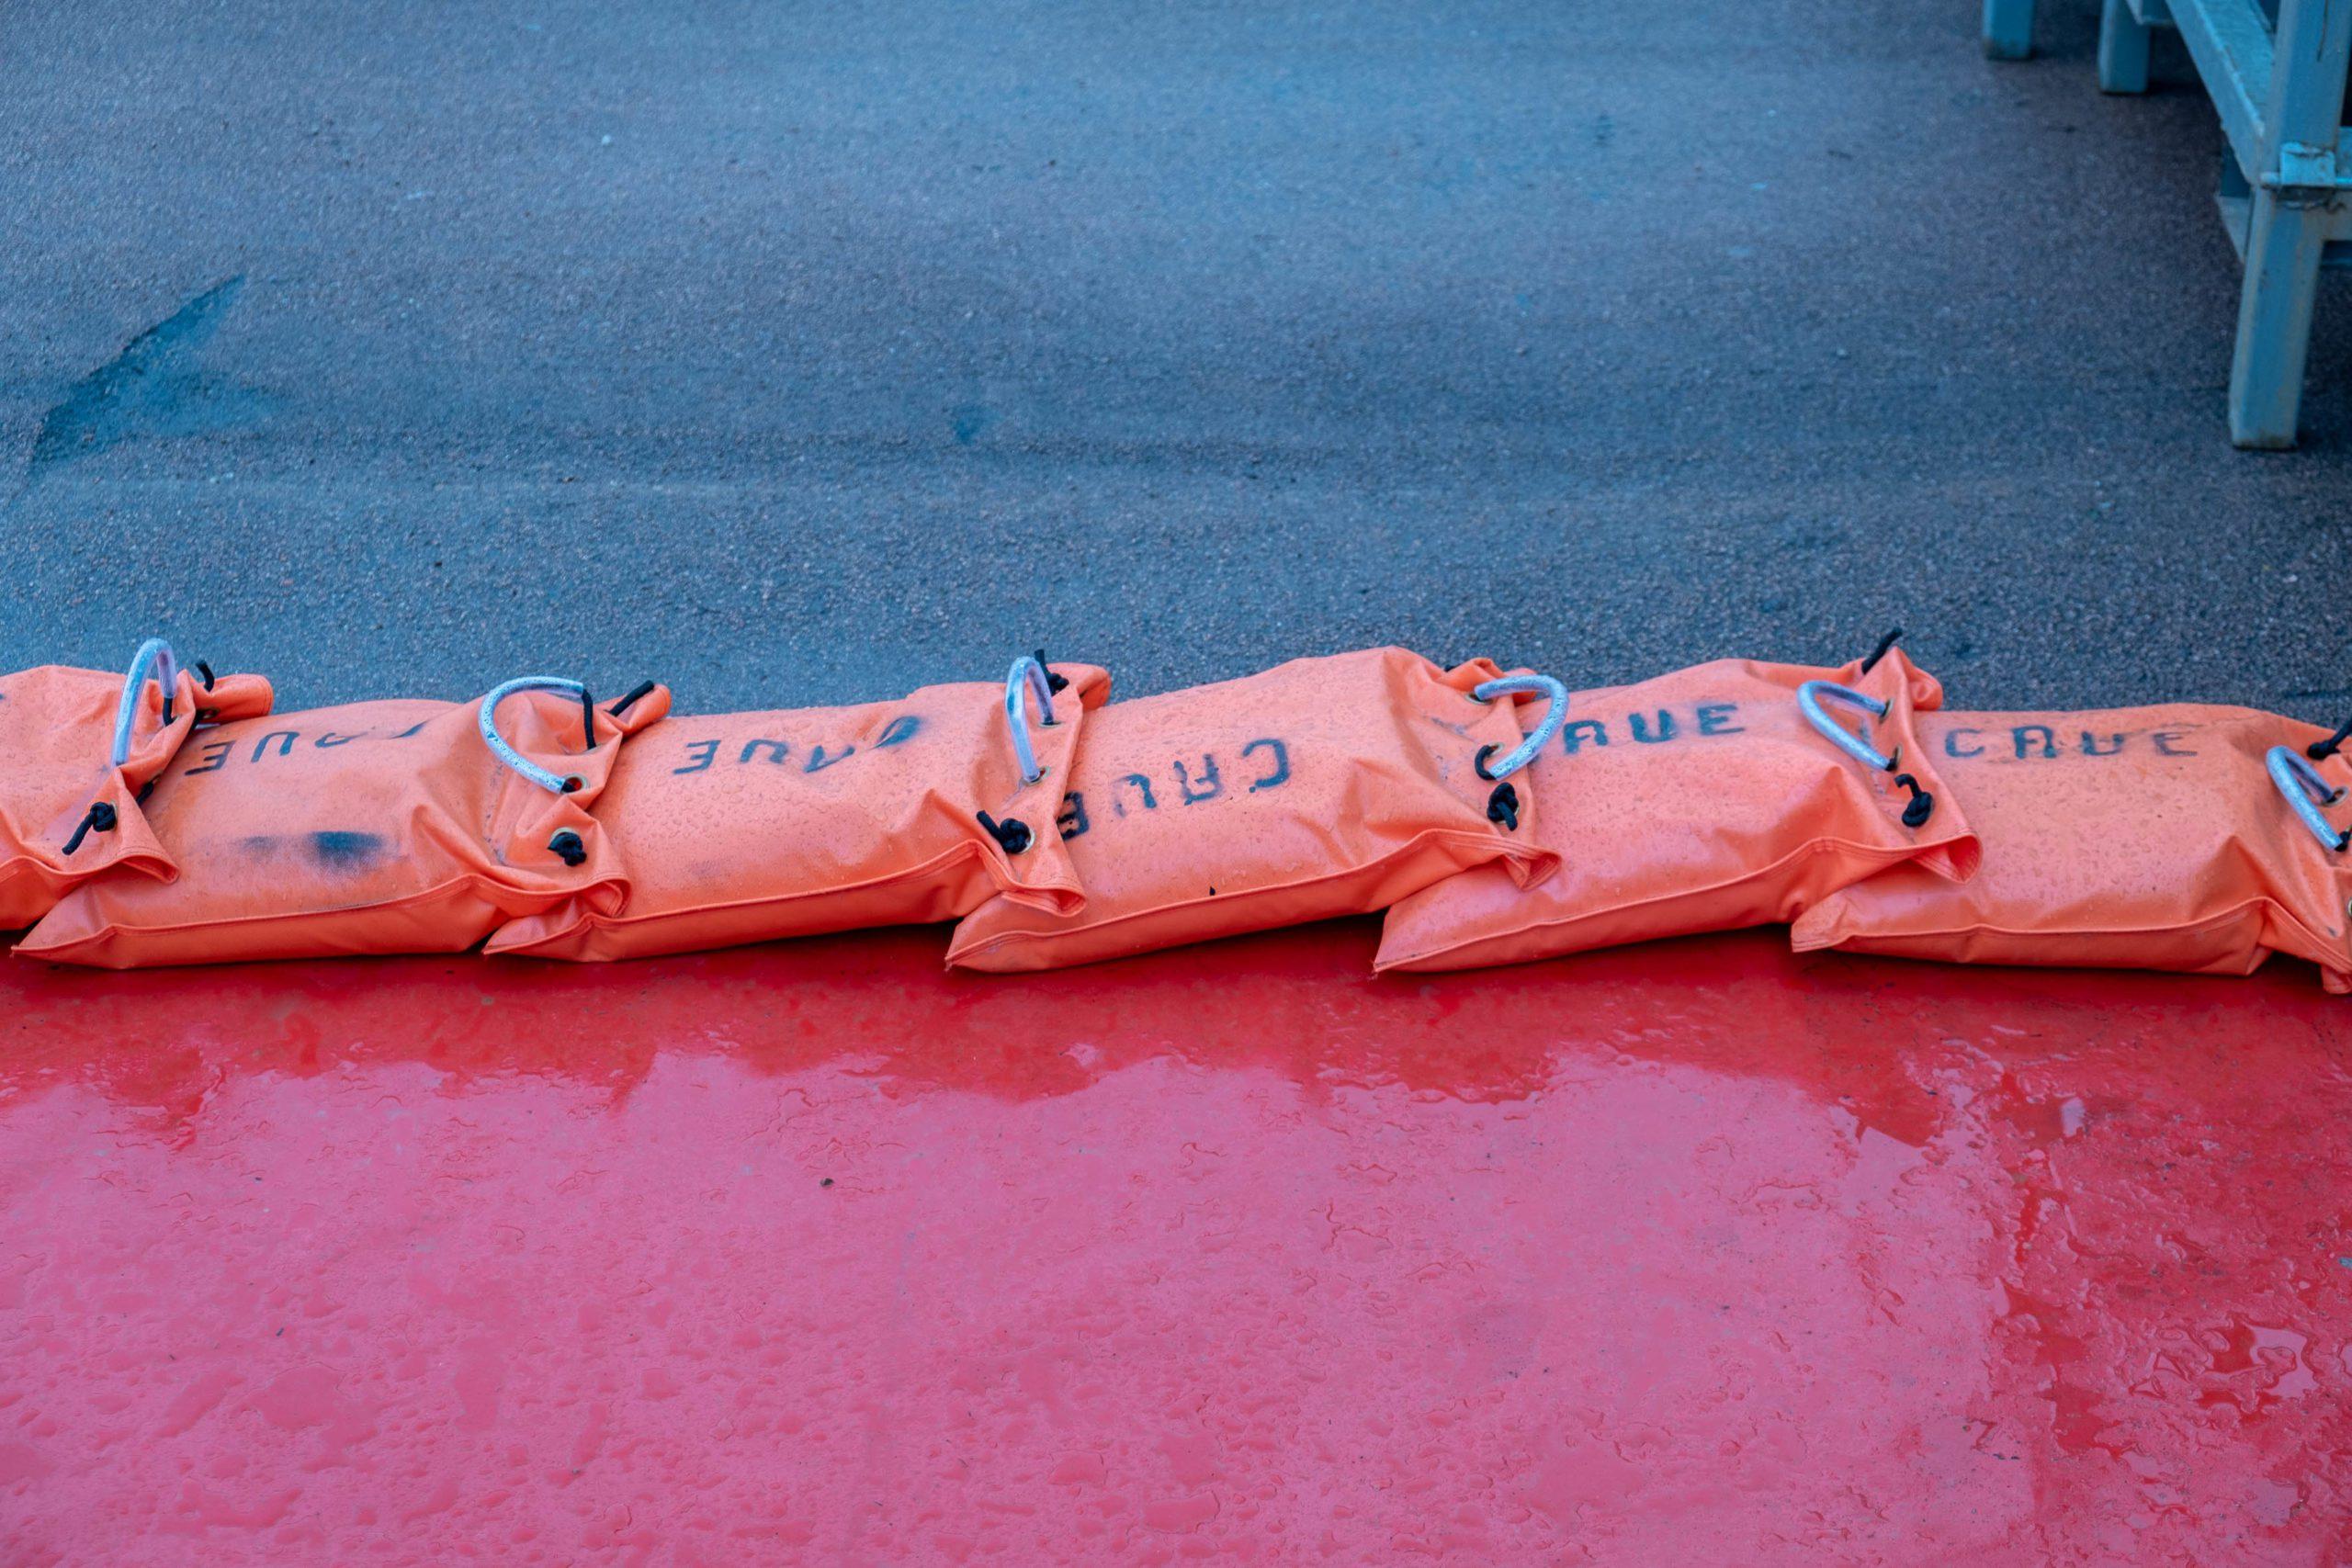 In Chalon-sur-Saone (71), the town has installed its anti-flood system. Chalon-sur-Saone, 06 February 2021. Florian Jannot-Caeilleté / APJ / Hans Lucas.A Chalon-sur-Saone (71), la ville a installé son système anti-crue. Chalon-sur-Saone, 06 février 2021. Florian Jannot-Caeilleté / APJ / Hans Lucas.